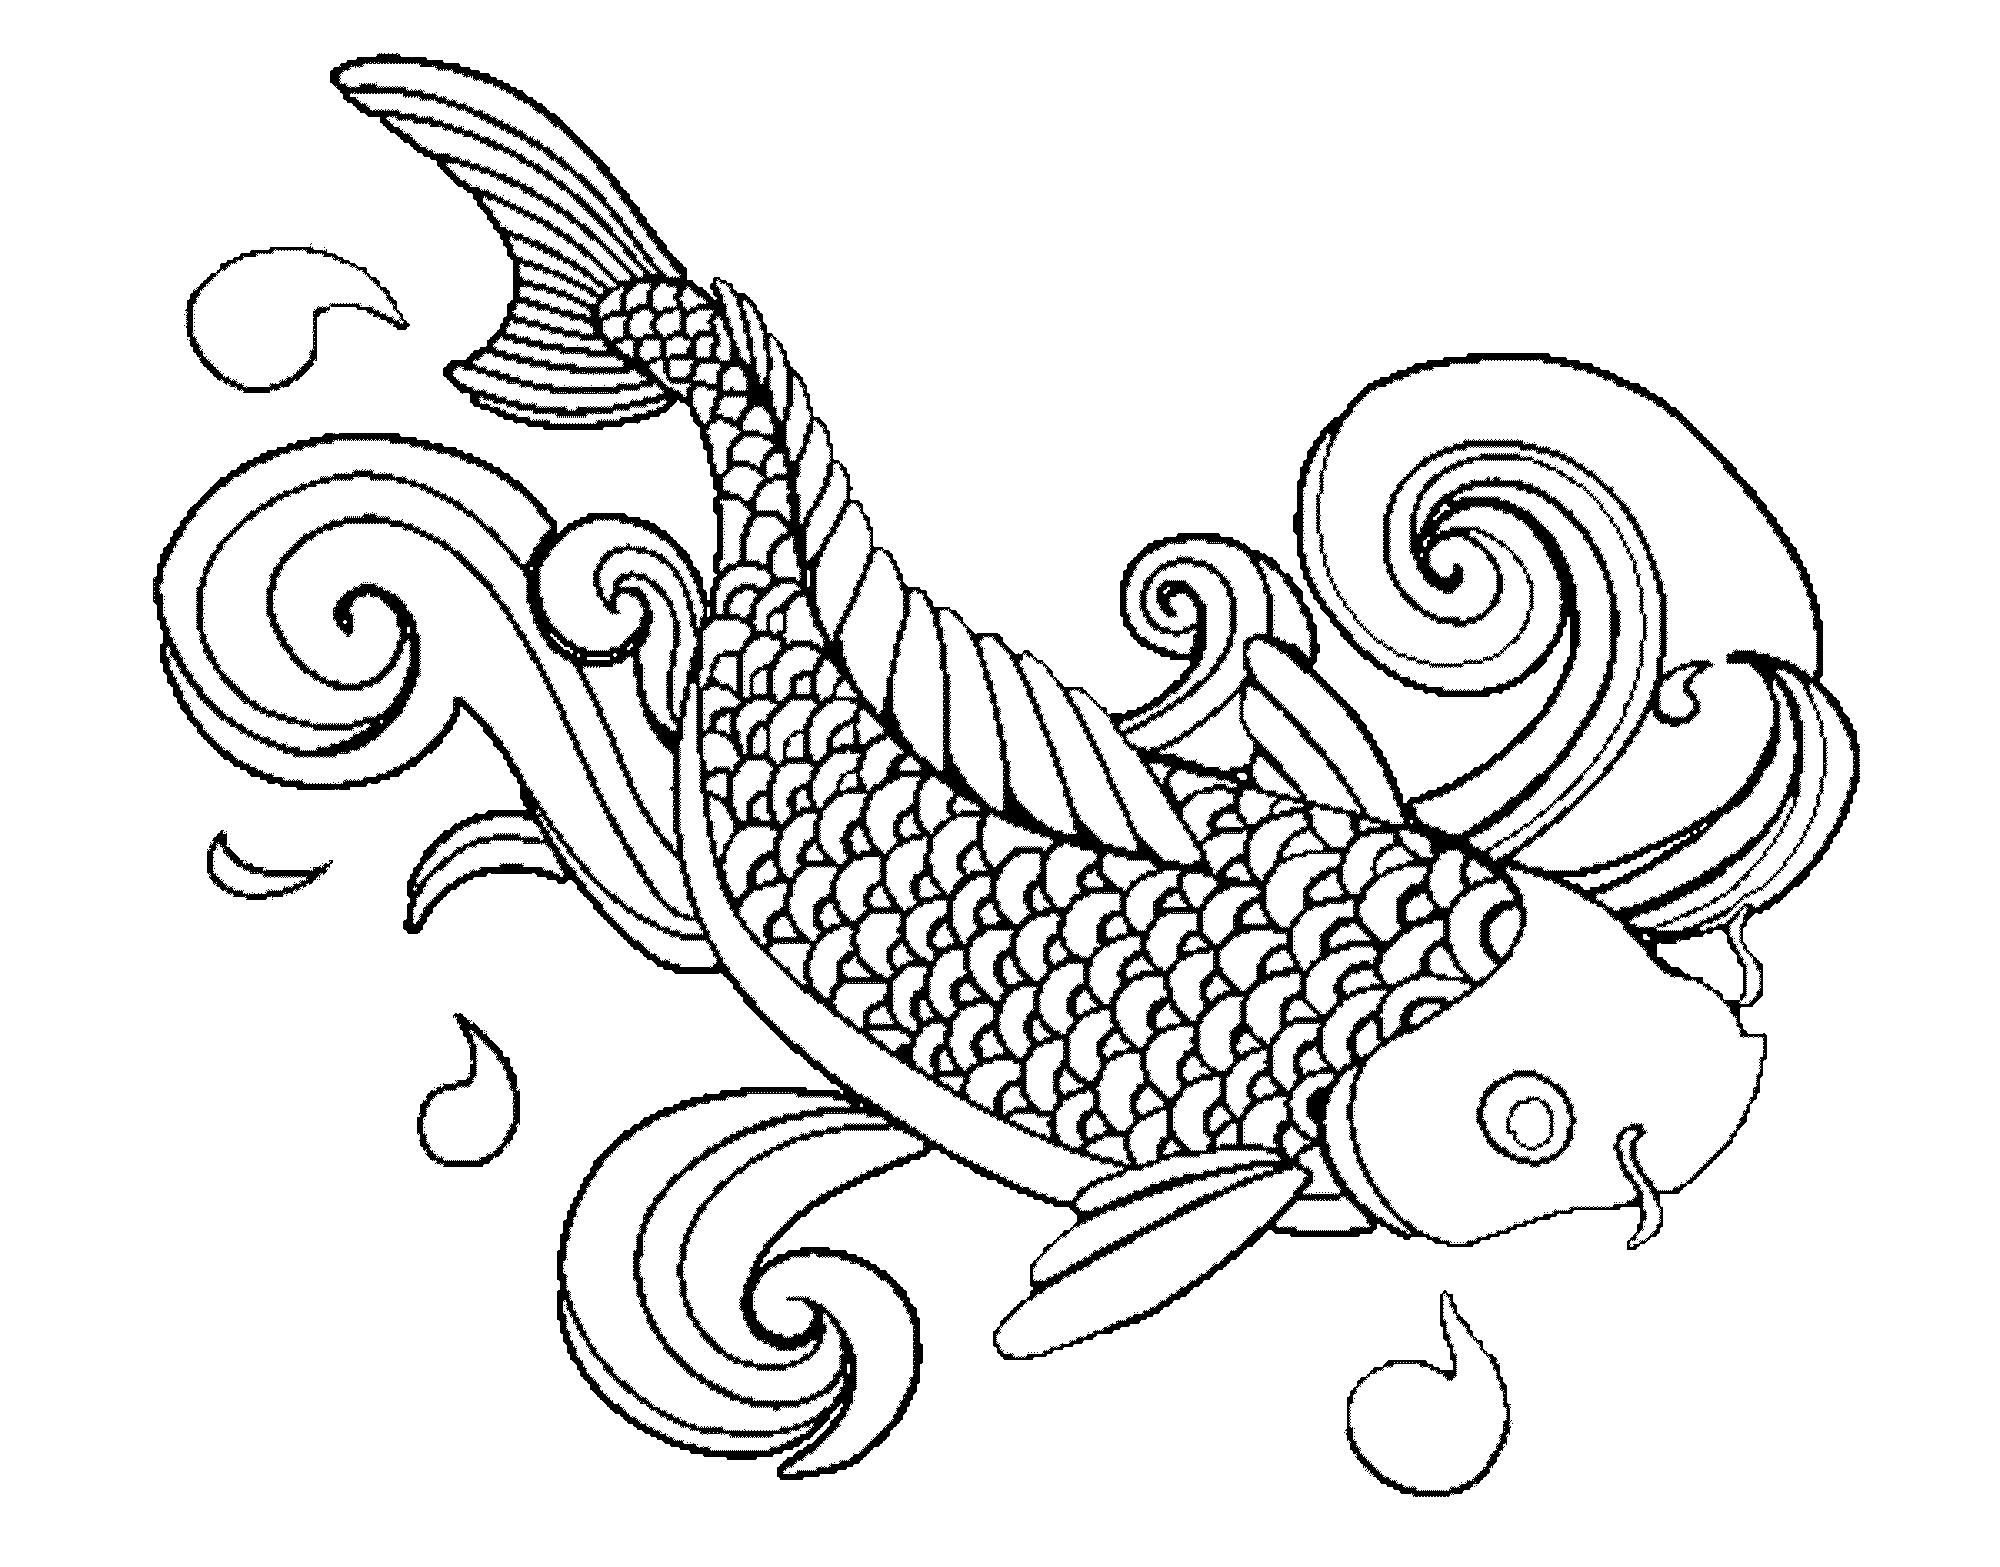 Koi Fish Pencil Drawing at GetDrawings.com | Free for personal use ...